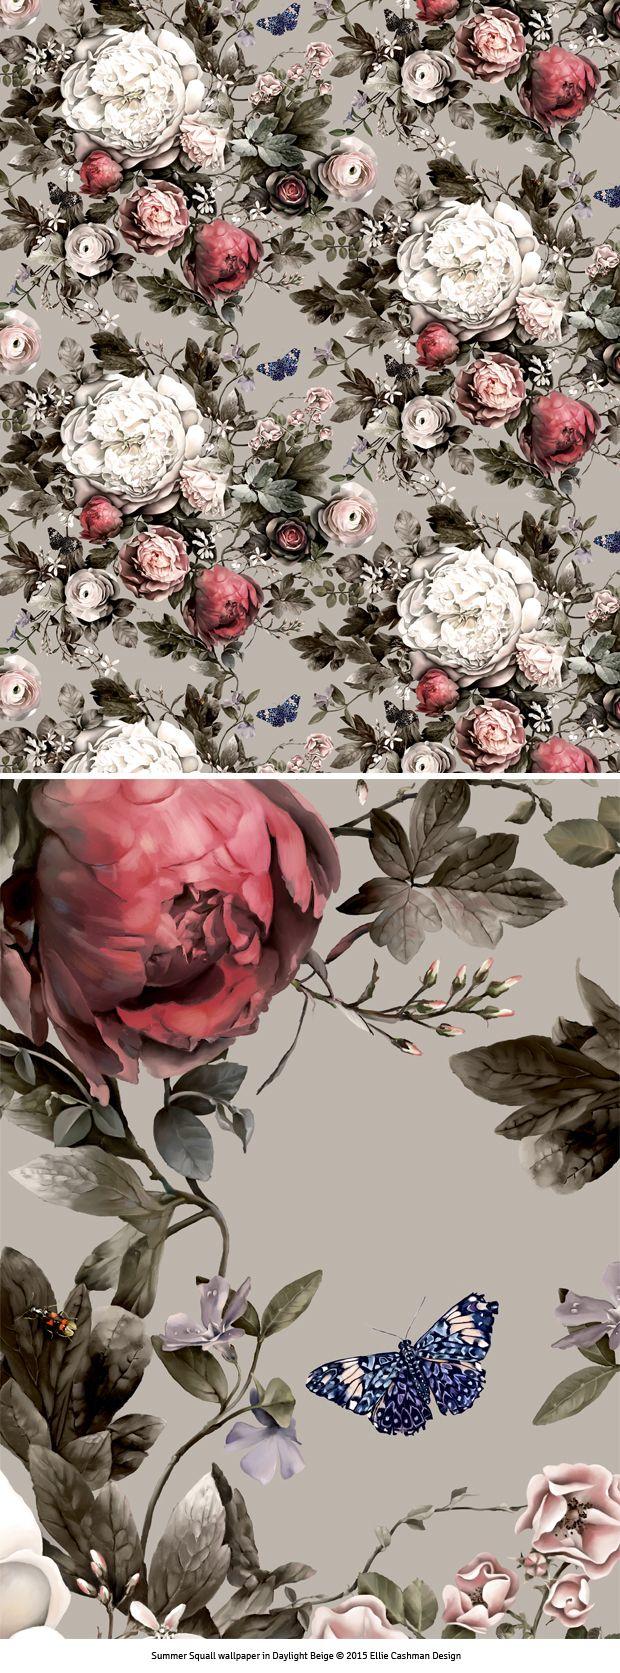 Black floral print wallpaper dark floral wallpaper by ellie cashman - Summer Squall Wallpaper And Fabric Design By Ellie Cashman Design